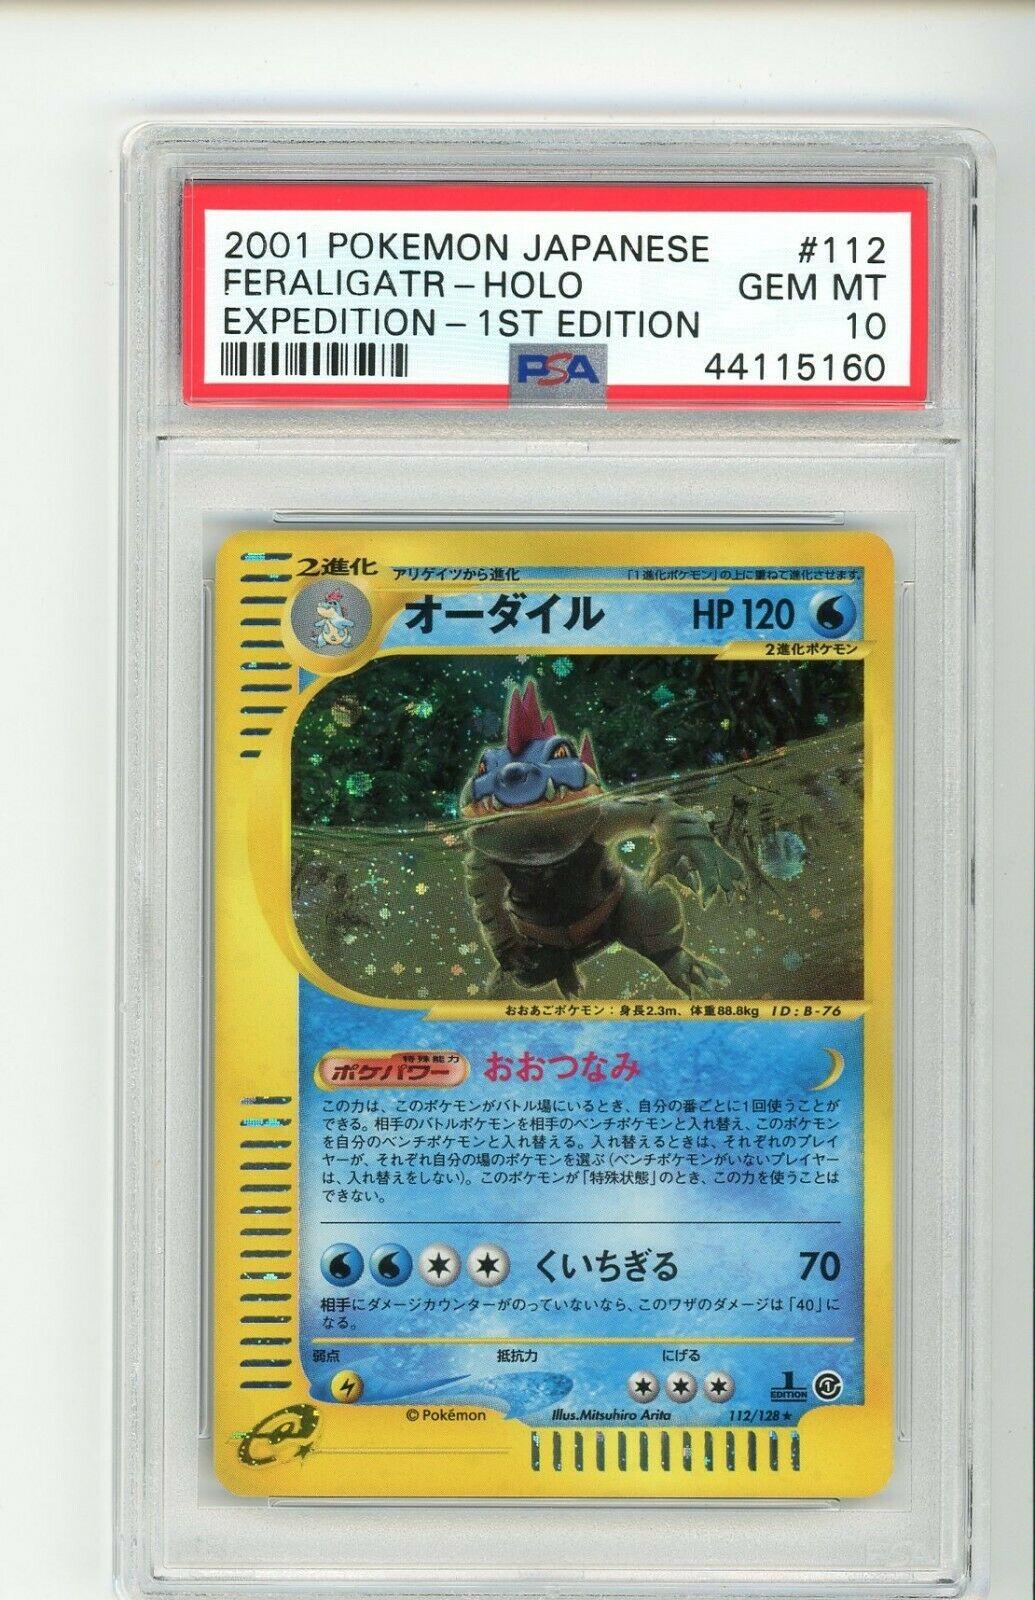 PSA 10 POKEMON JAPANESE CARD EXPEDITION 1ST EDITION FERALIGATR 2001 112128